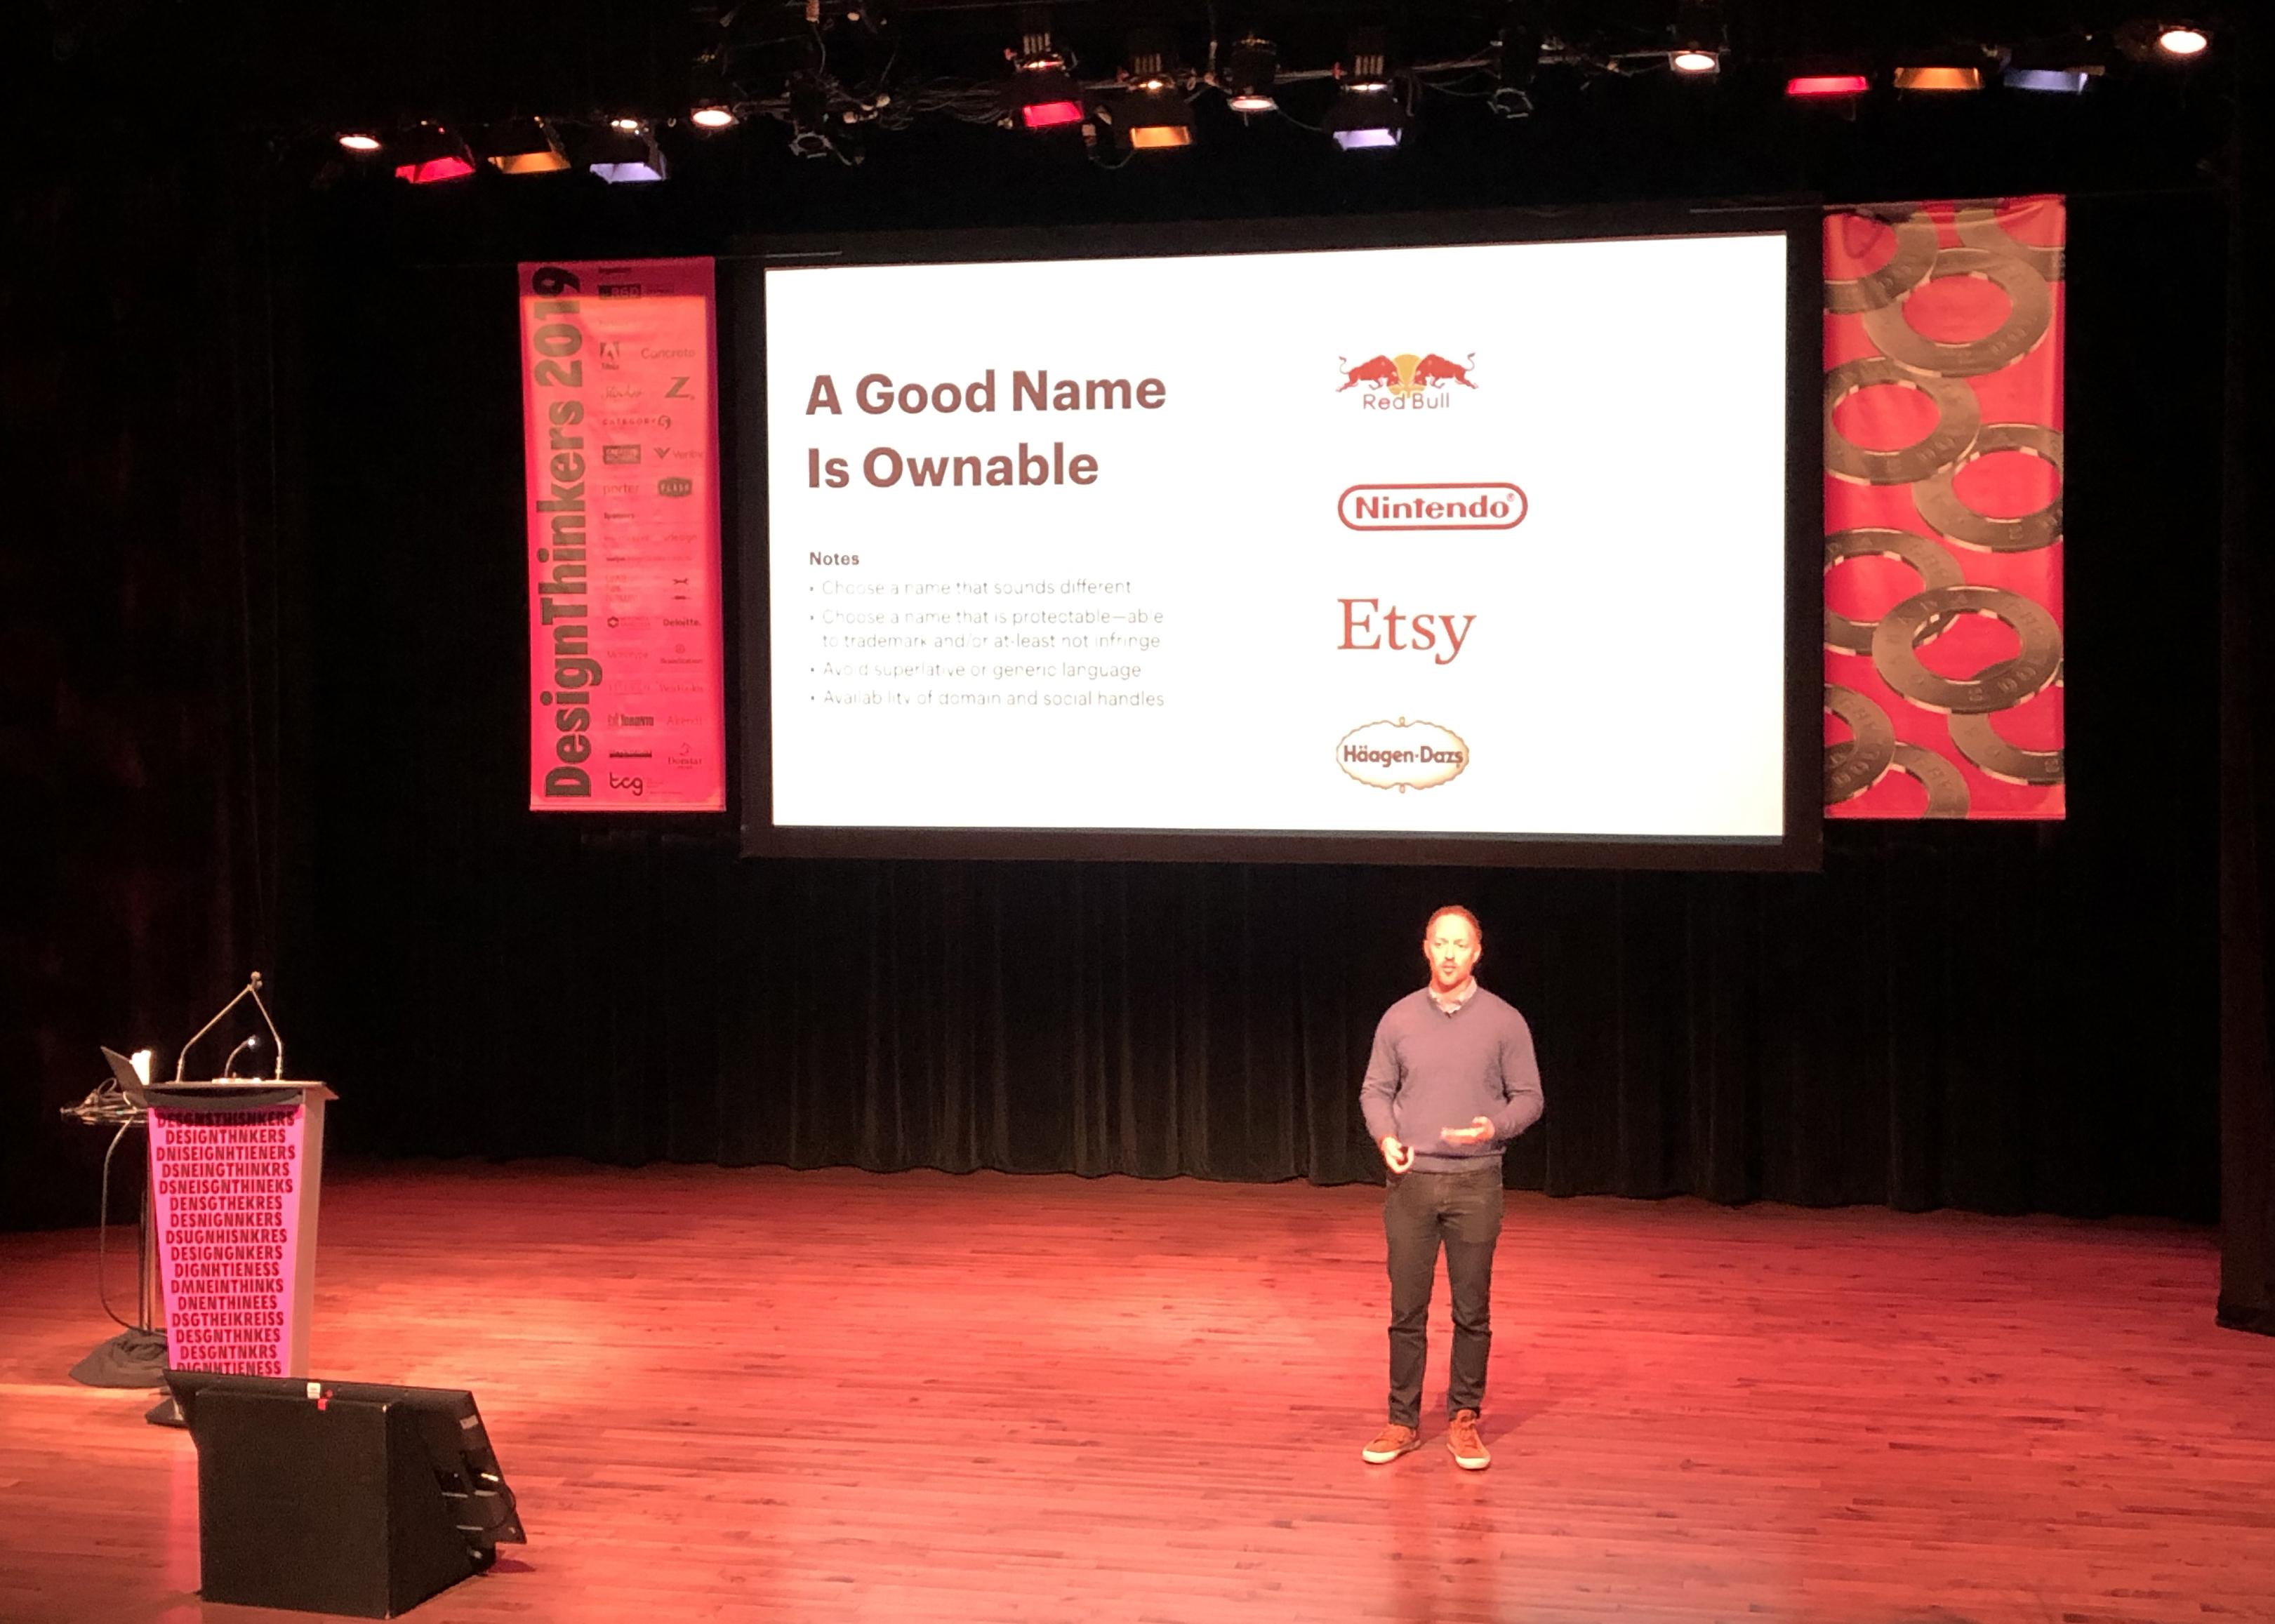 Blake Howard's brand naming presentation at DesignThinkers 2019